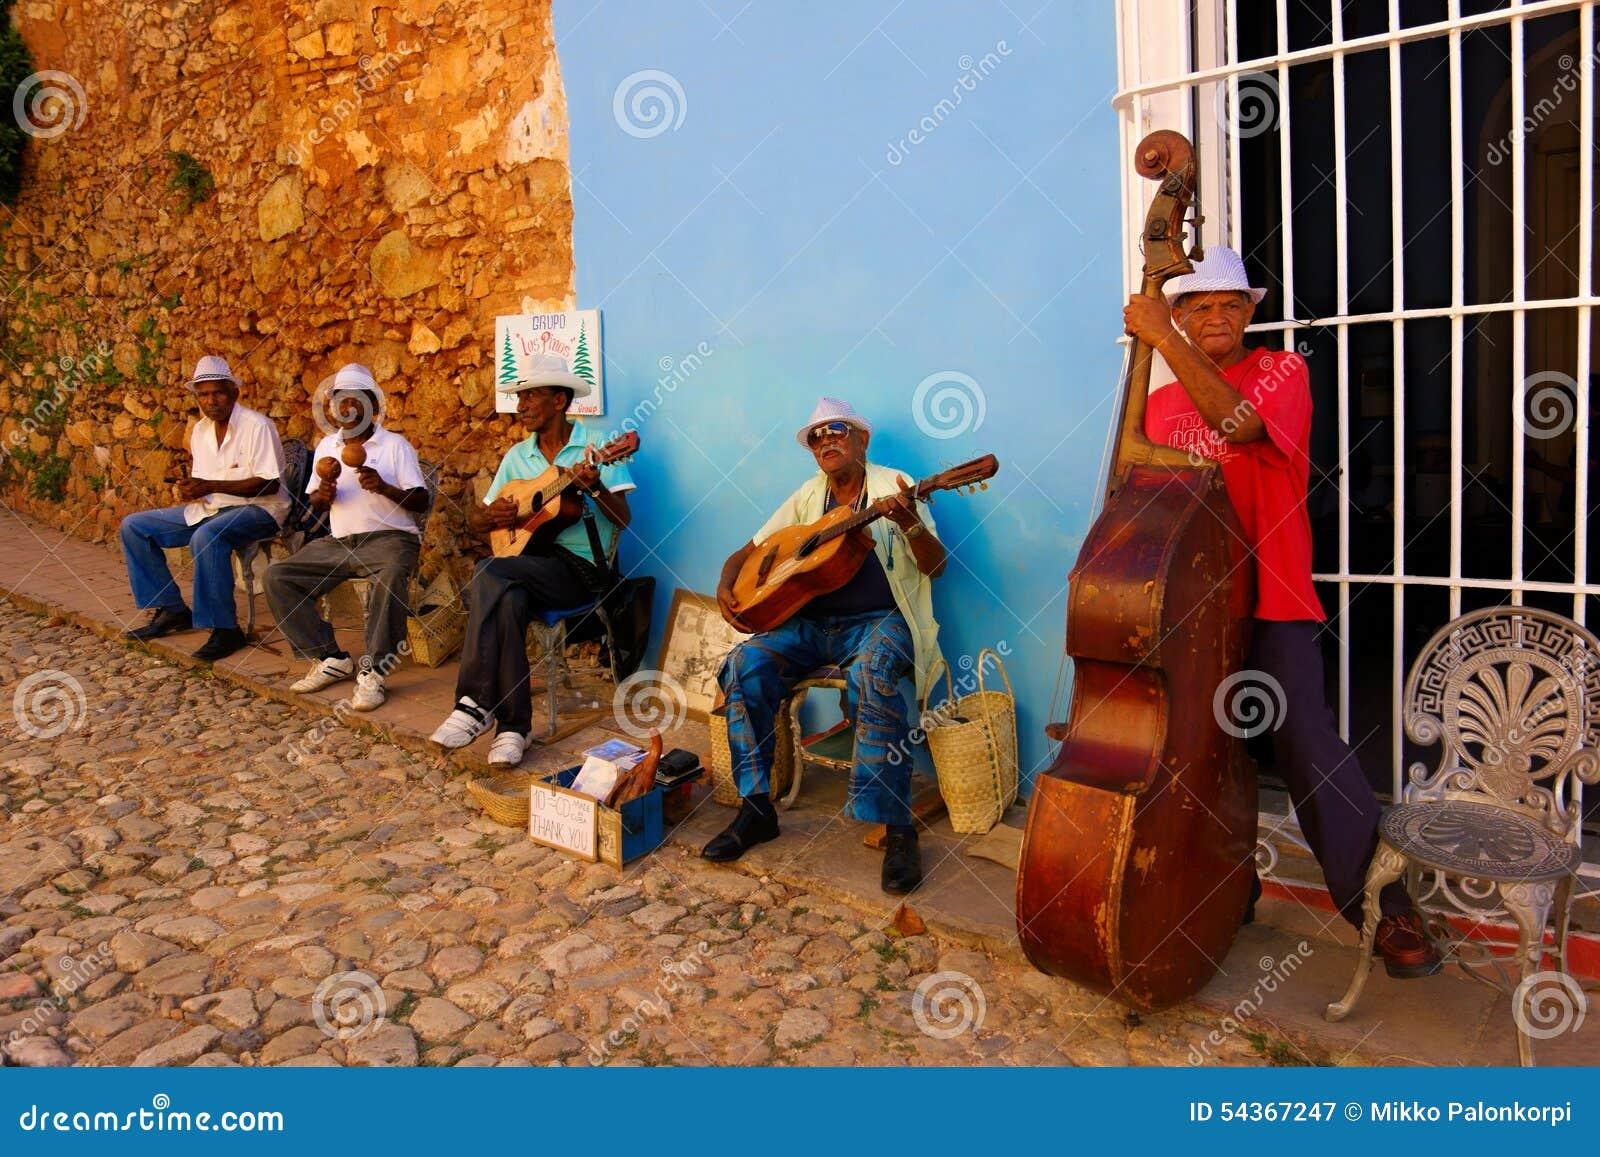 street band pla... Zig Zag Pattern Clipart